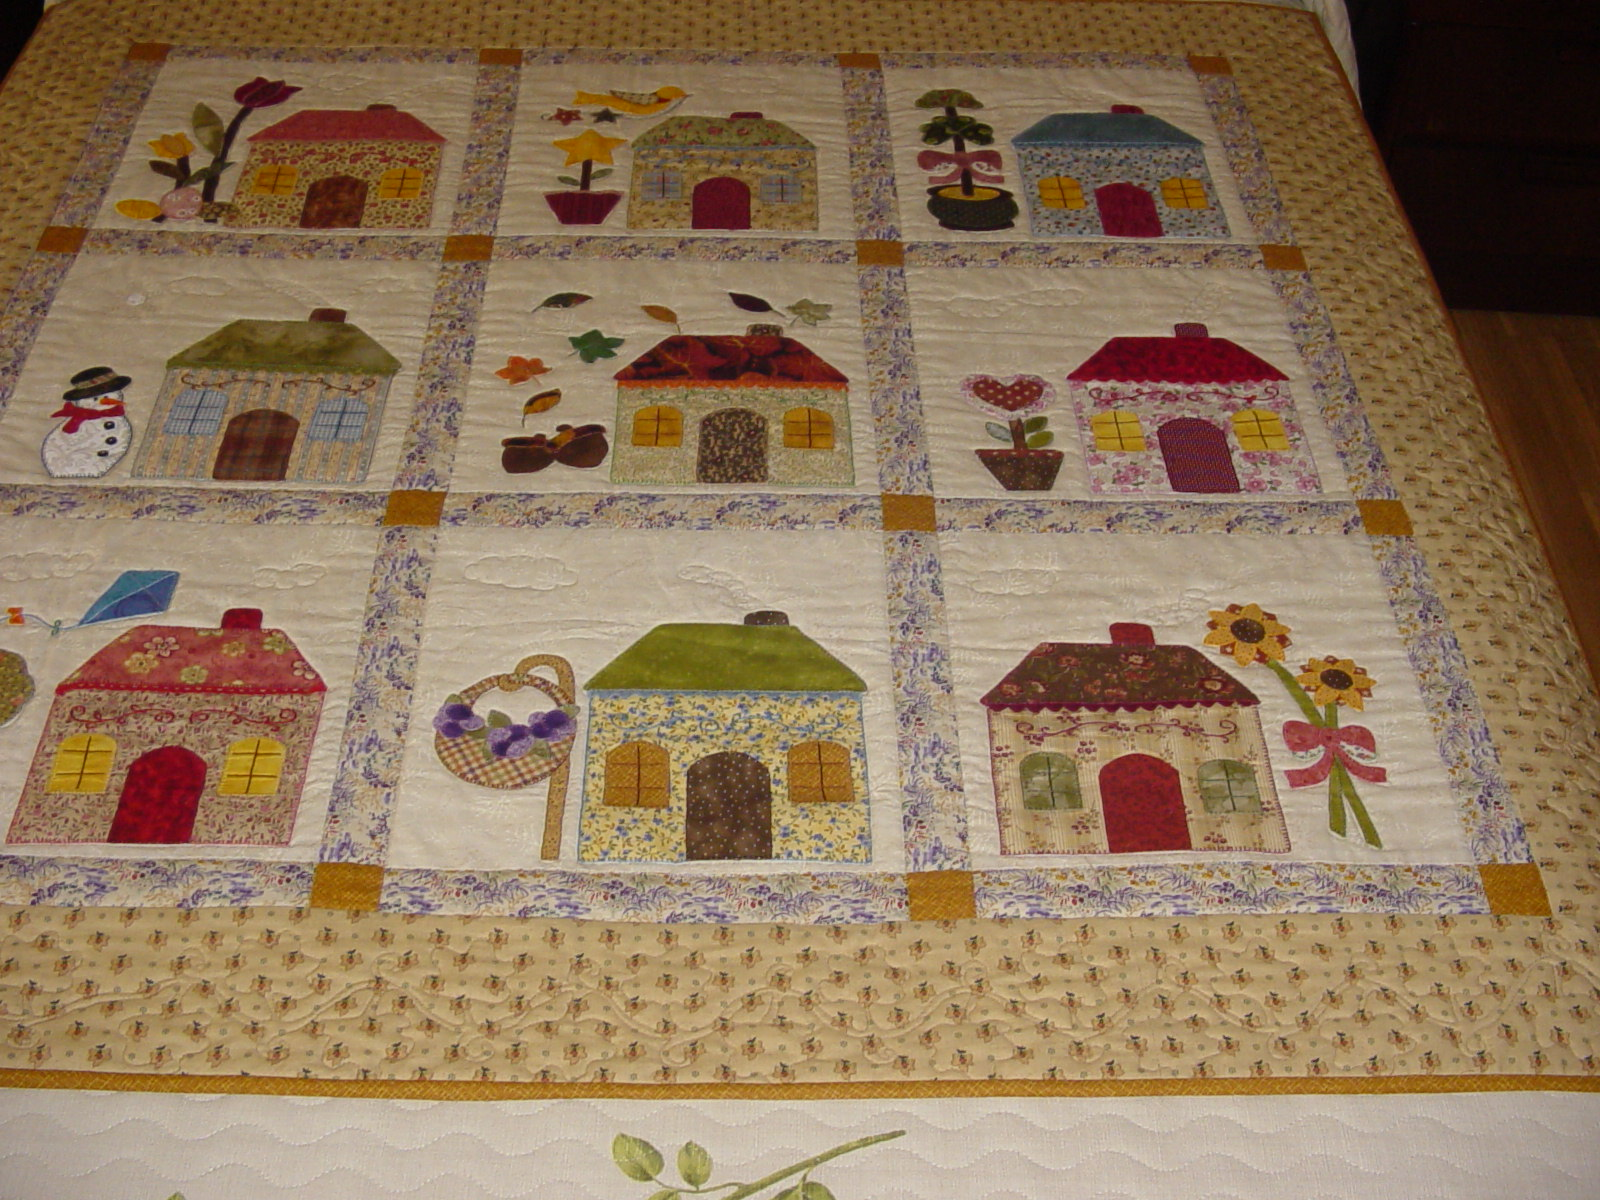 Trozitoatrozito colcha de casas - Casas de patchwork ...